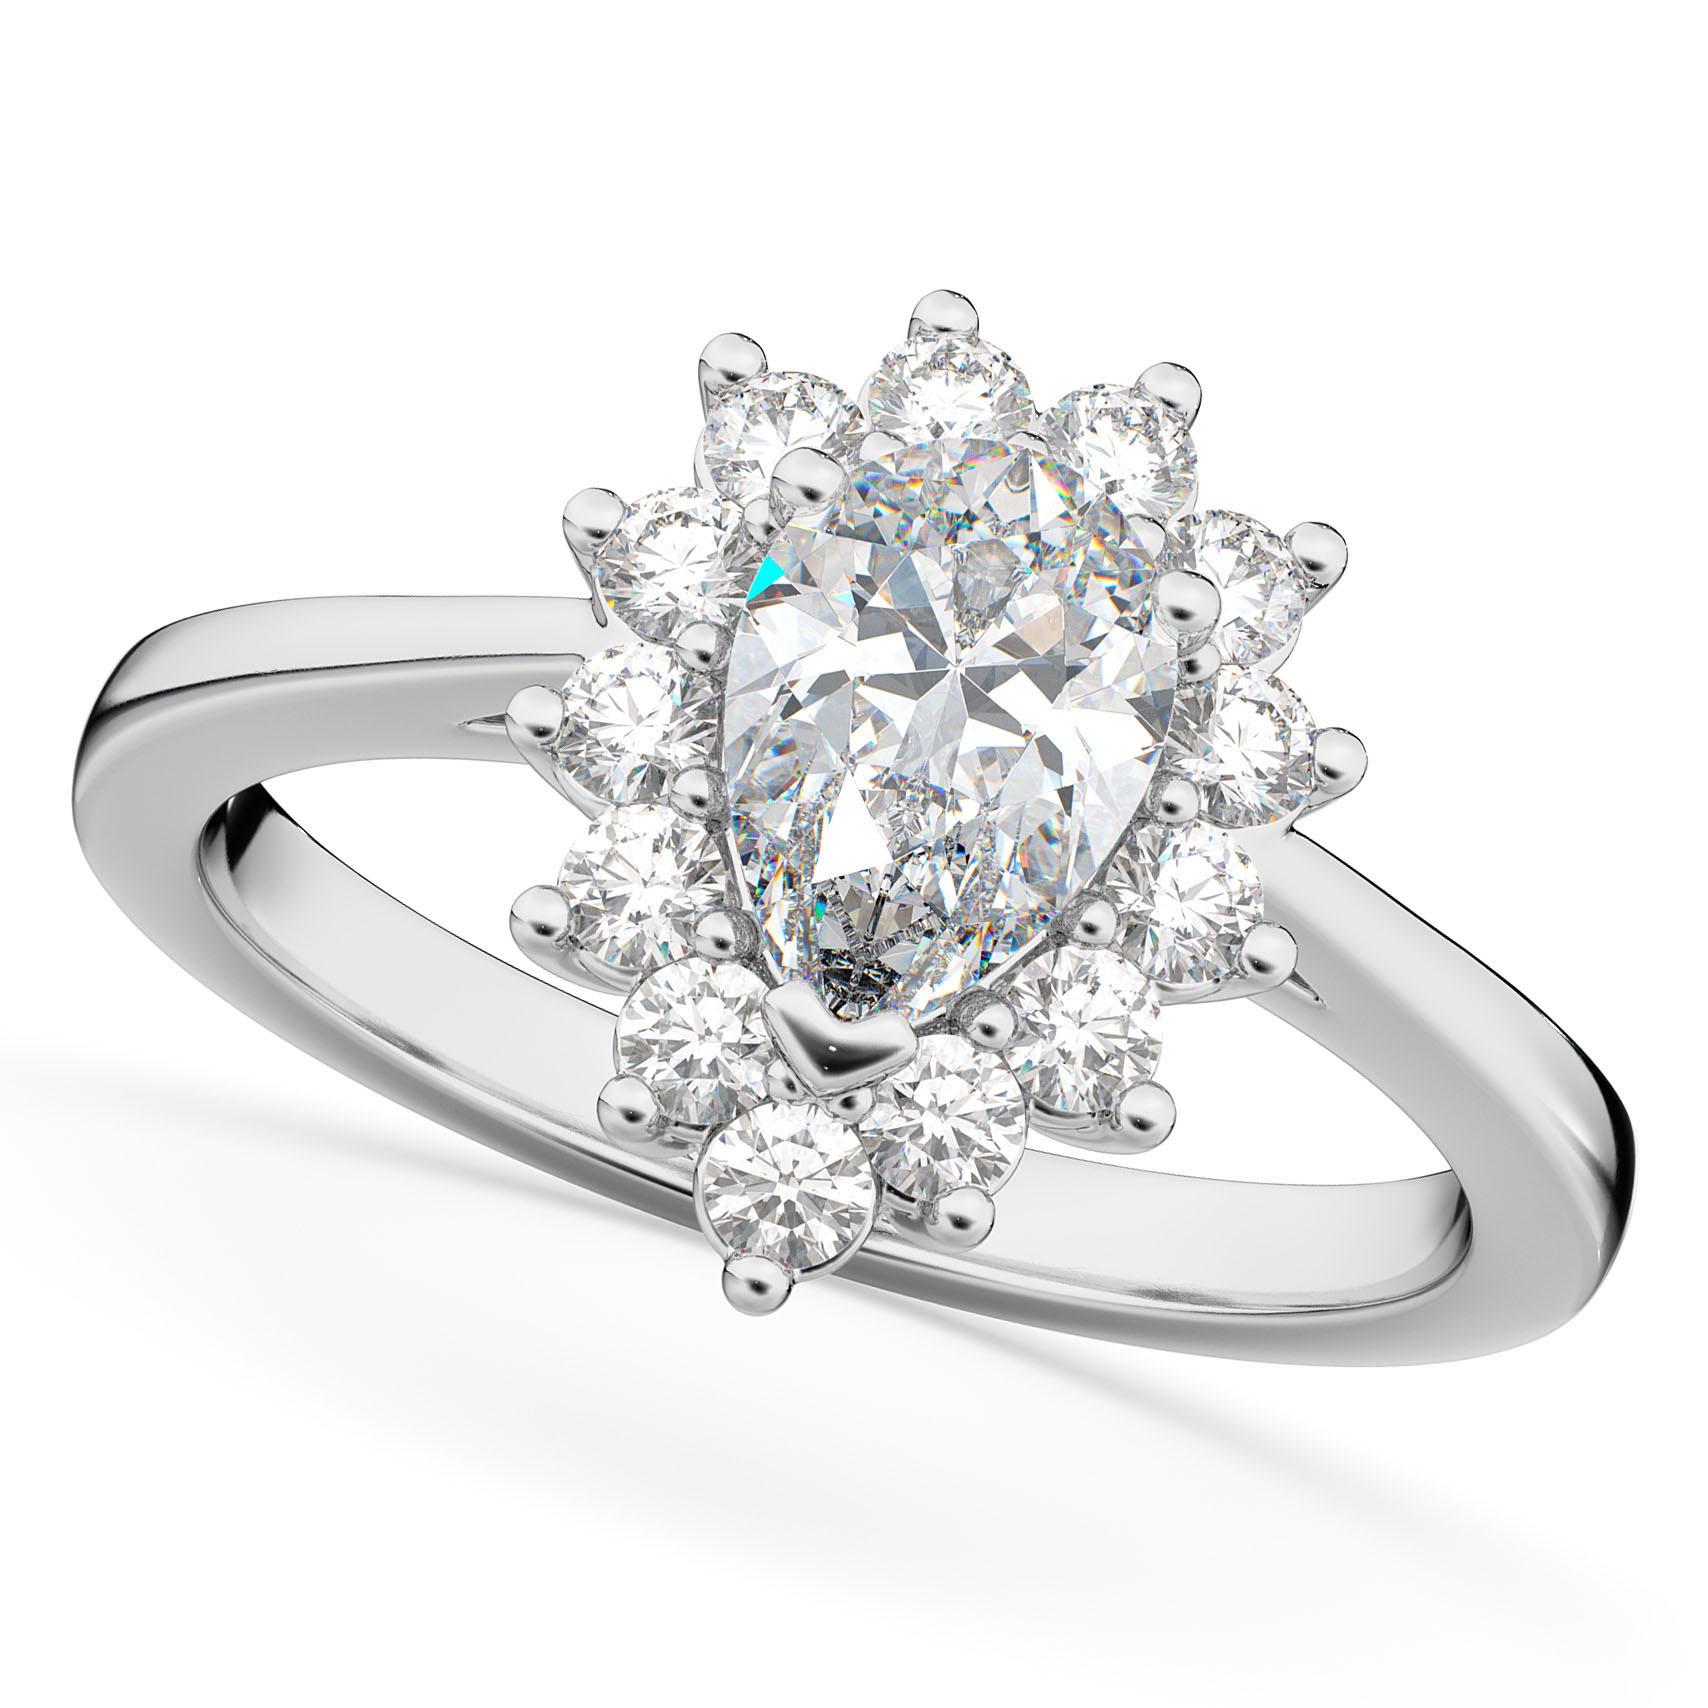 Halo Pear Shaped Diamond Engagement Ring 14k White Gold (1.12ct)